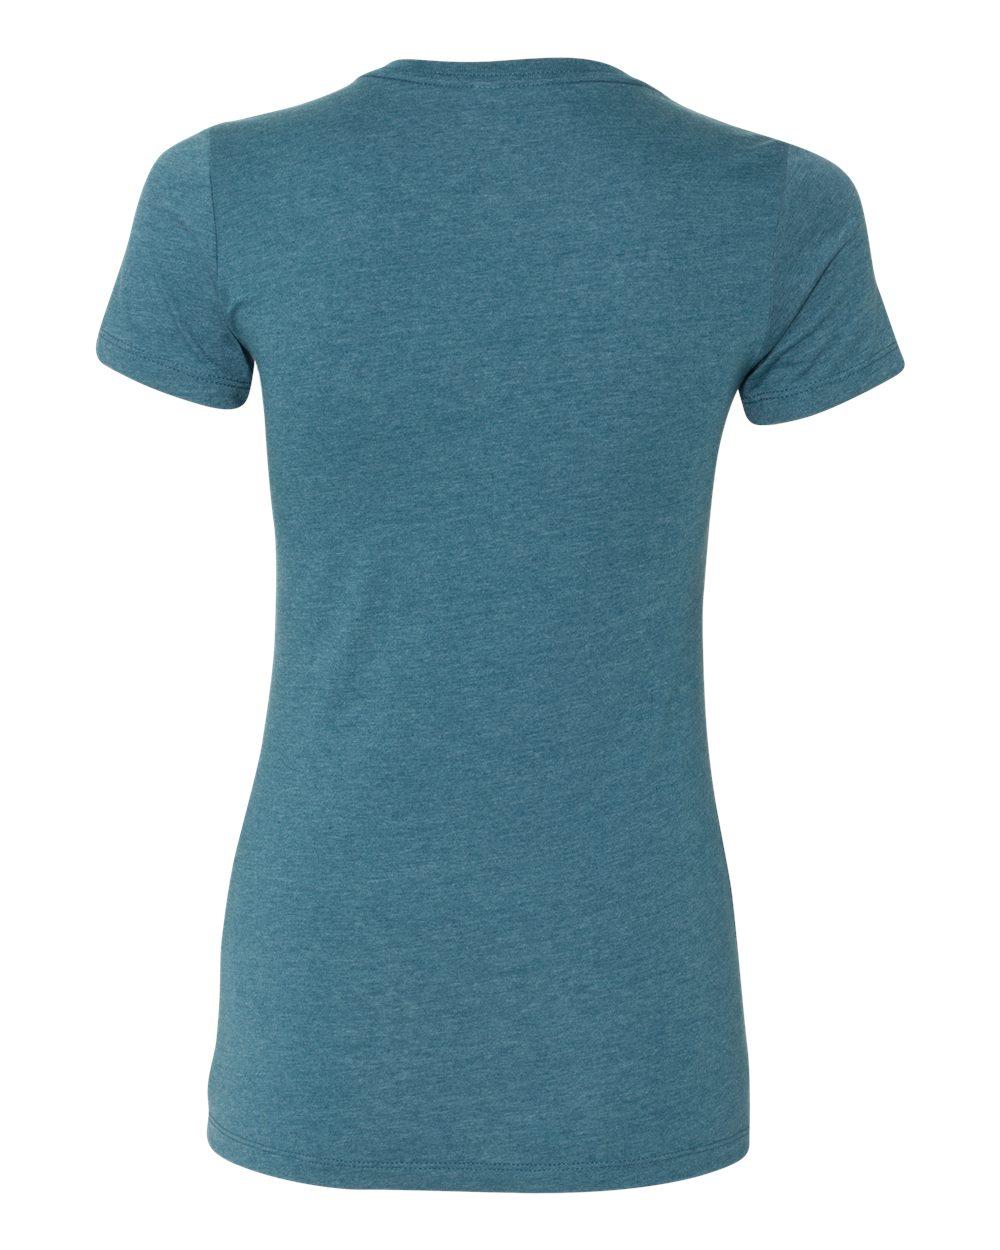 Bella-Canvas-Women-039-s-Favorite-T-Shirt-6004-S-2XL thumbnail 157